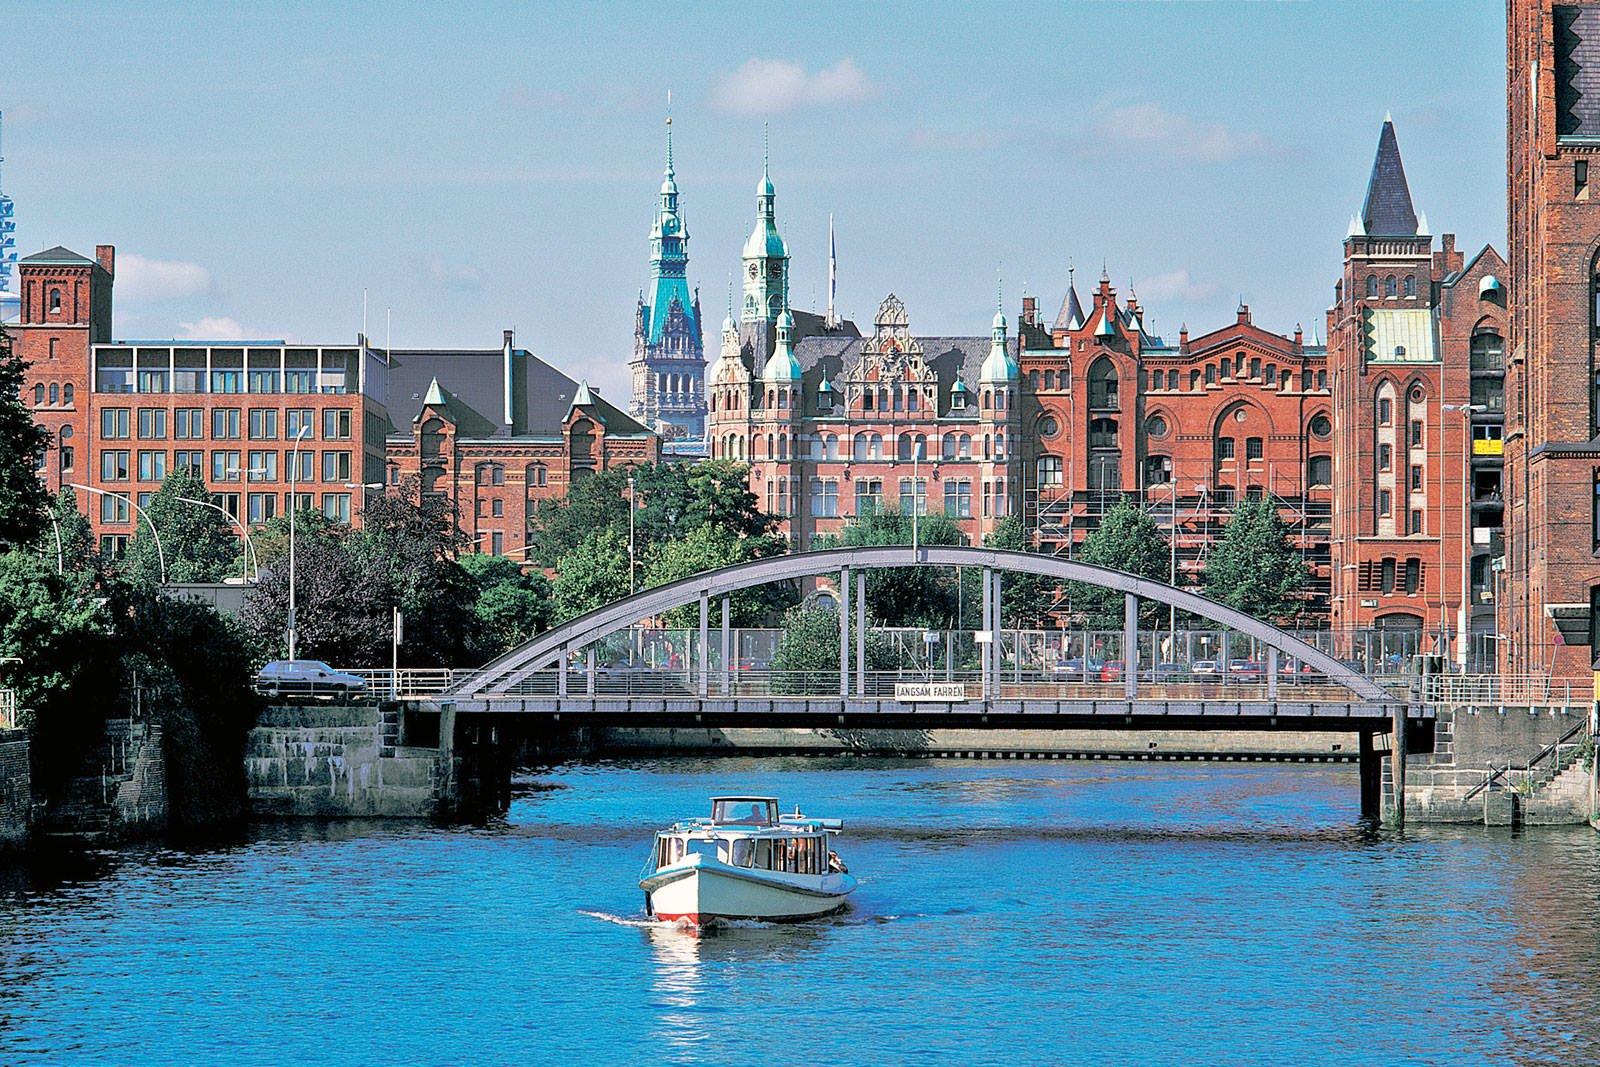 ваш гамбург фото города в сентябре один